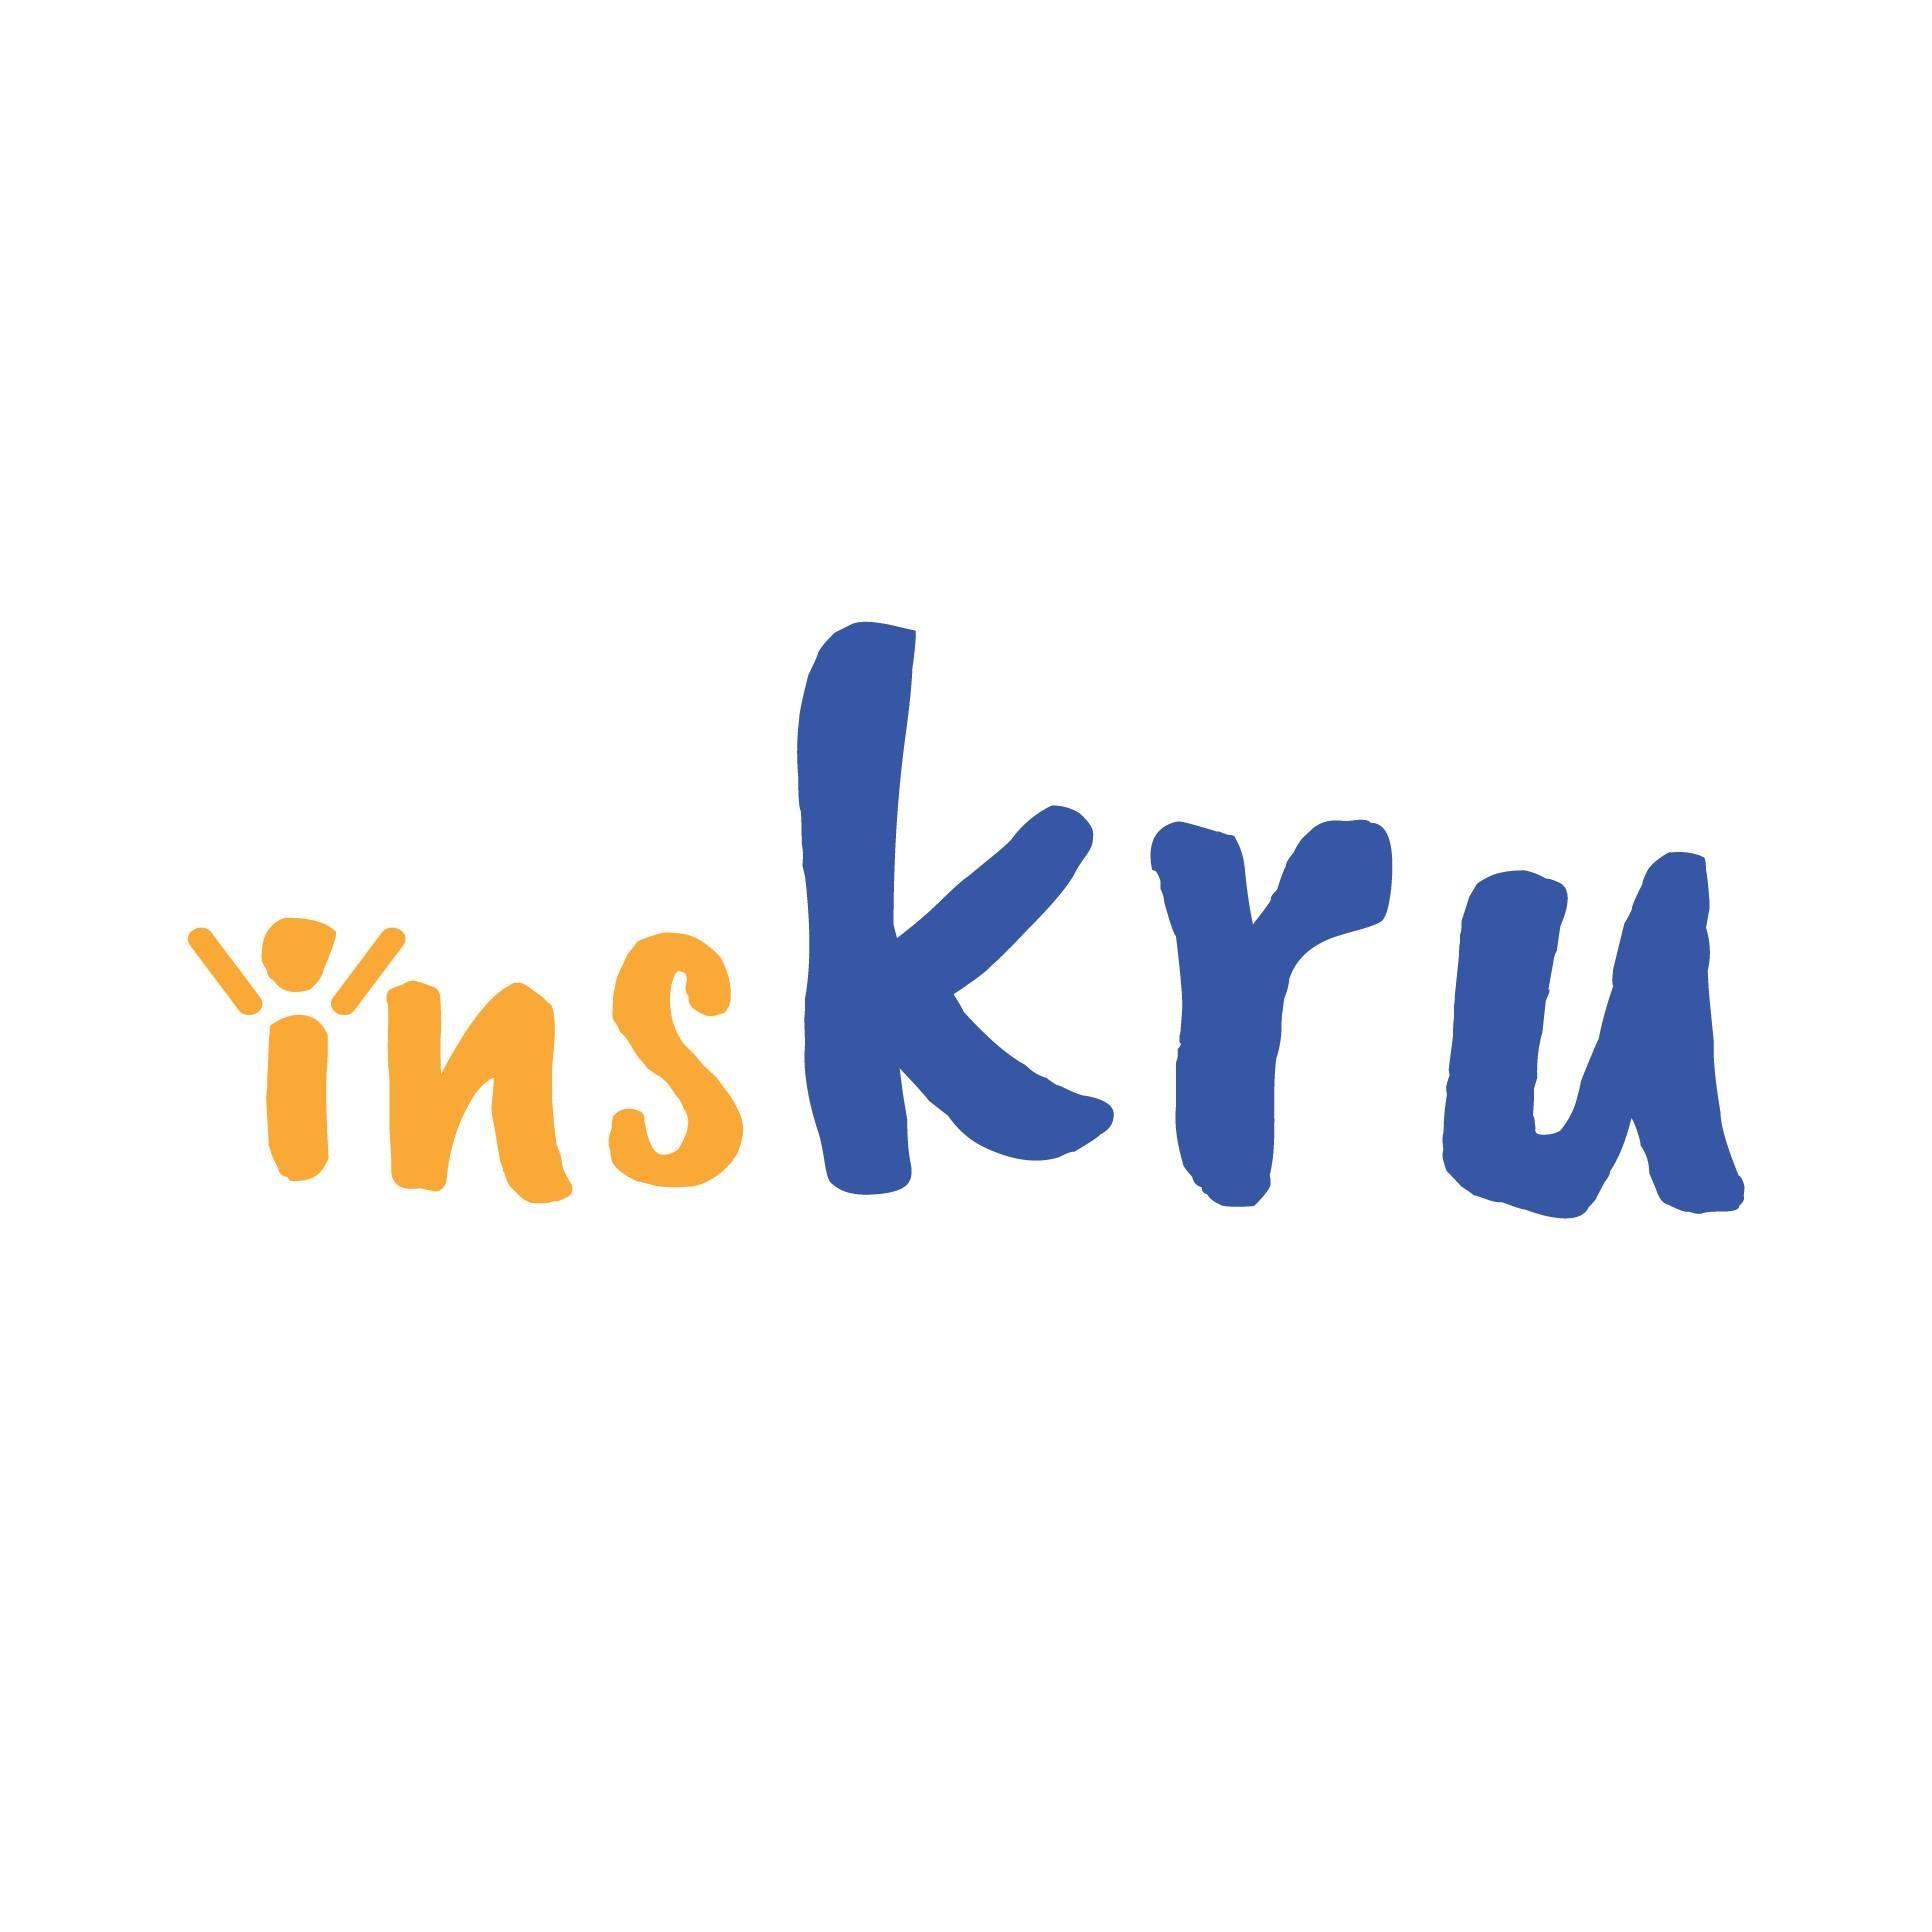 inskru logo